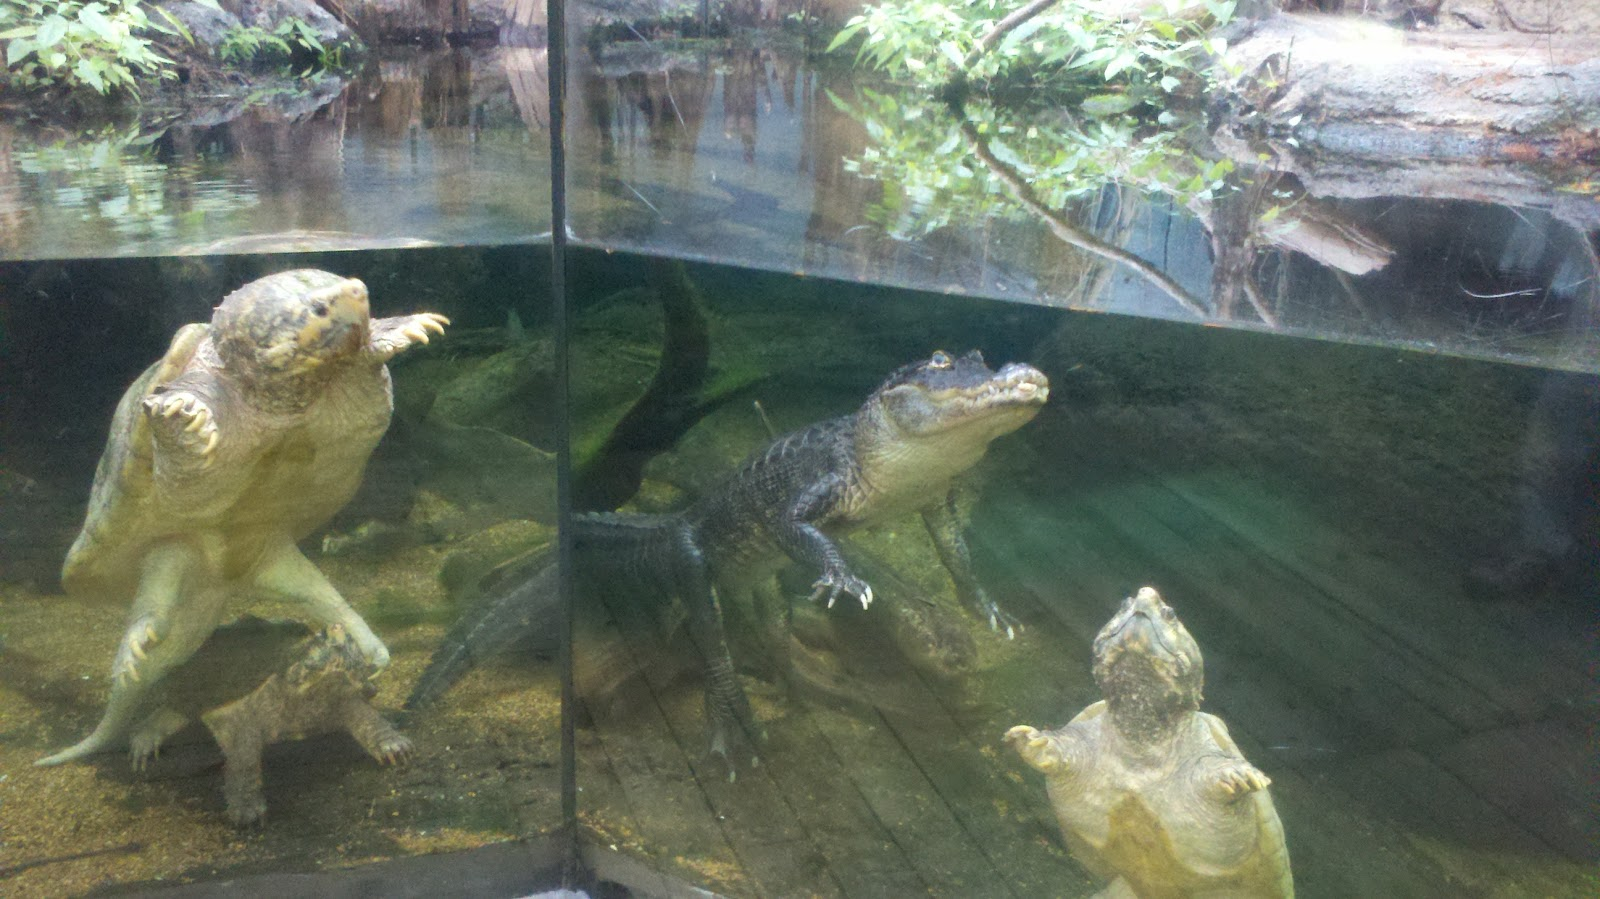 Tennessee Aquarium Blog: Really Big Reptiles Looking Like Best Friends